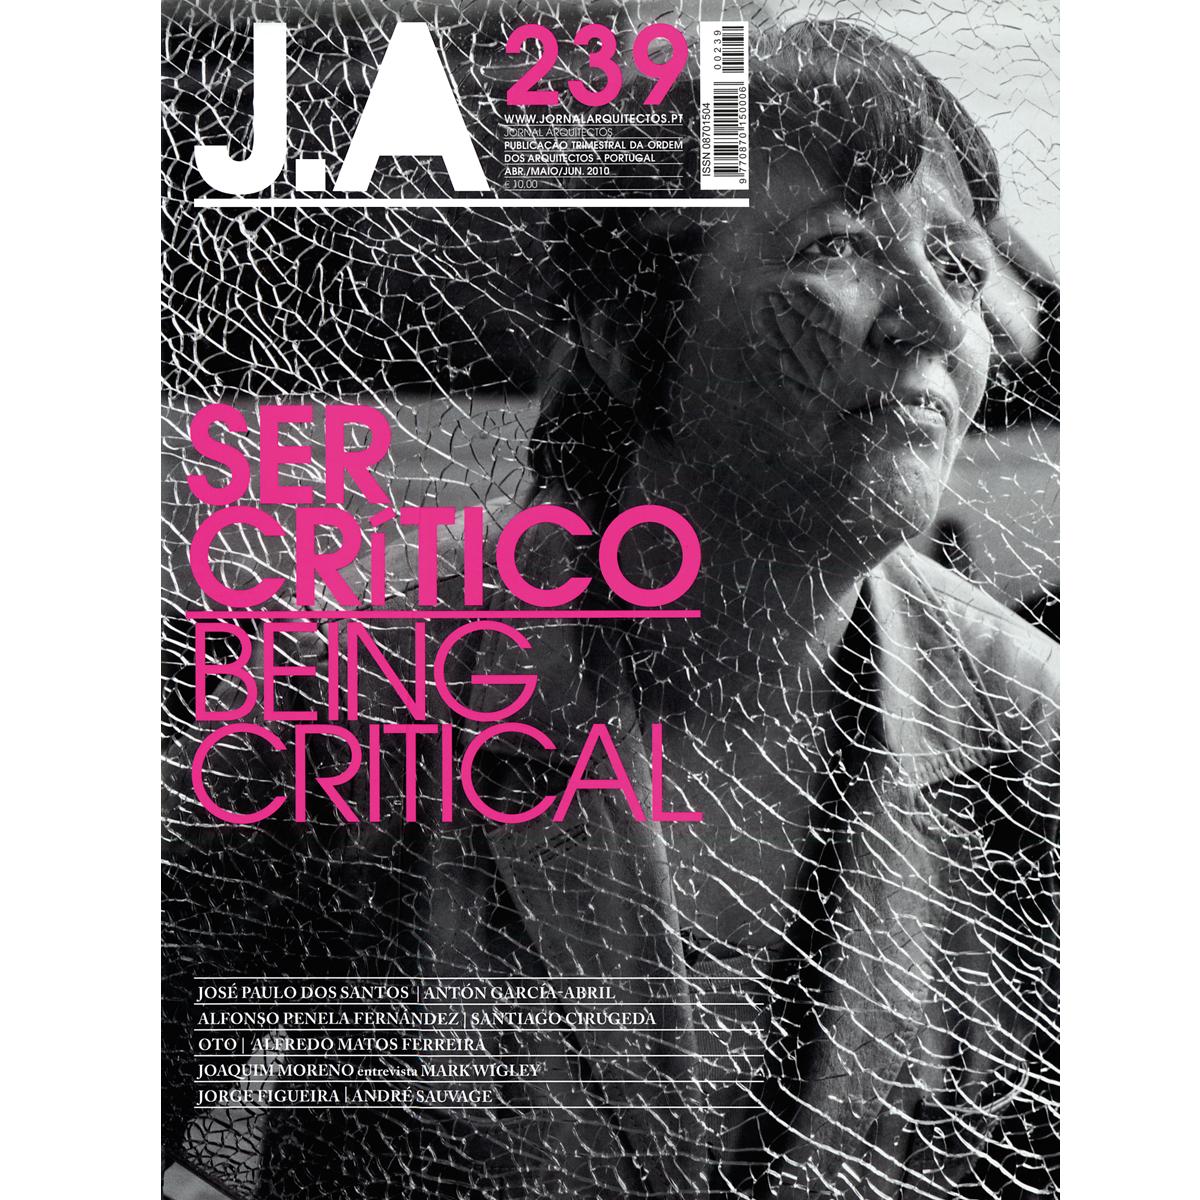 JA: Being Critical